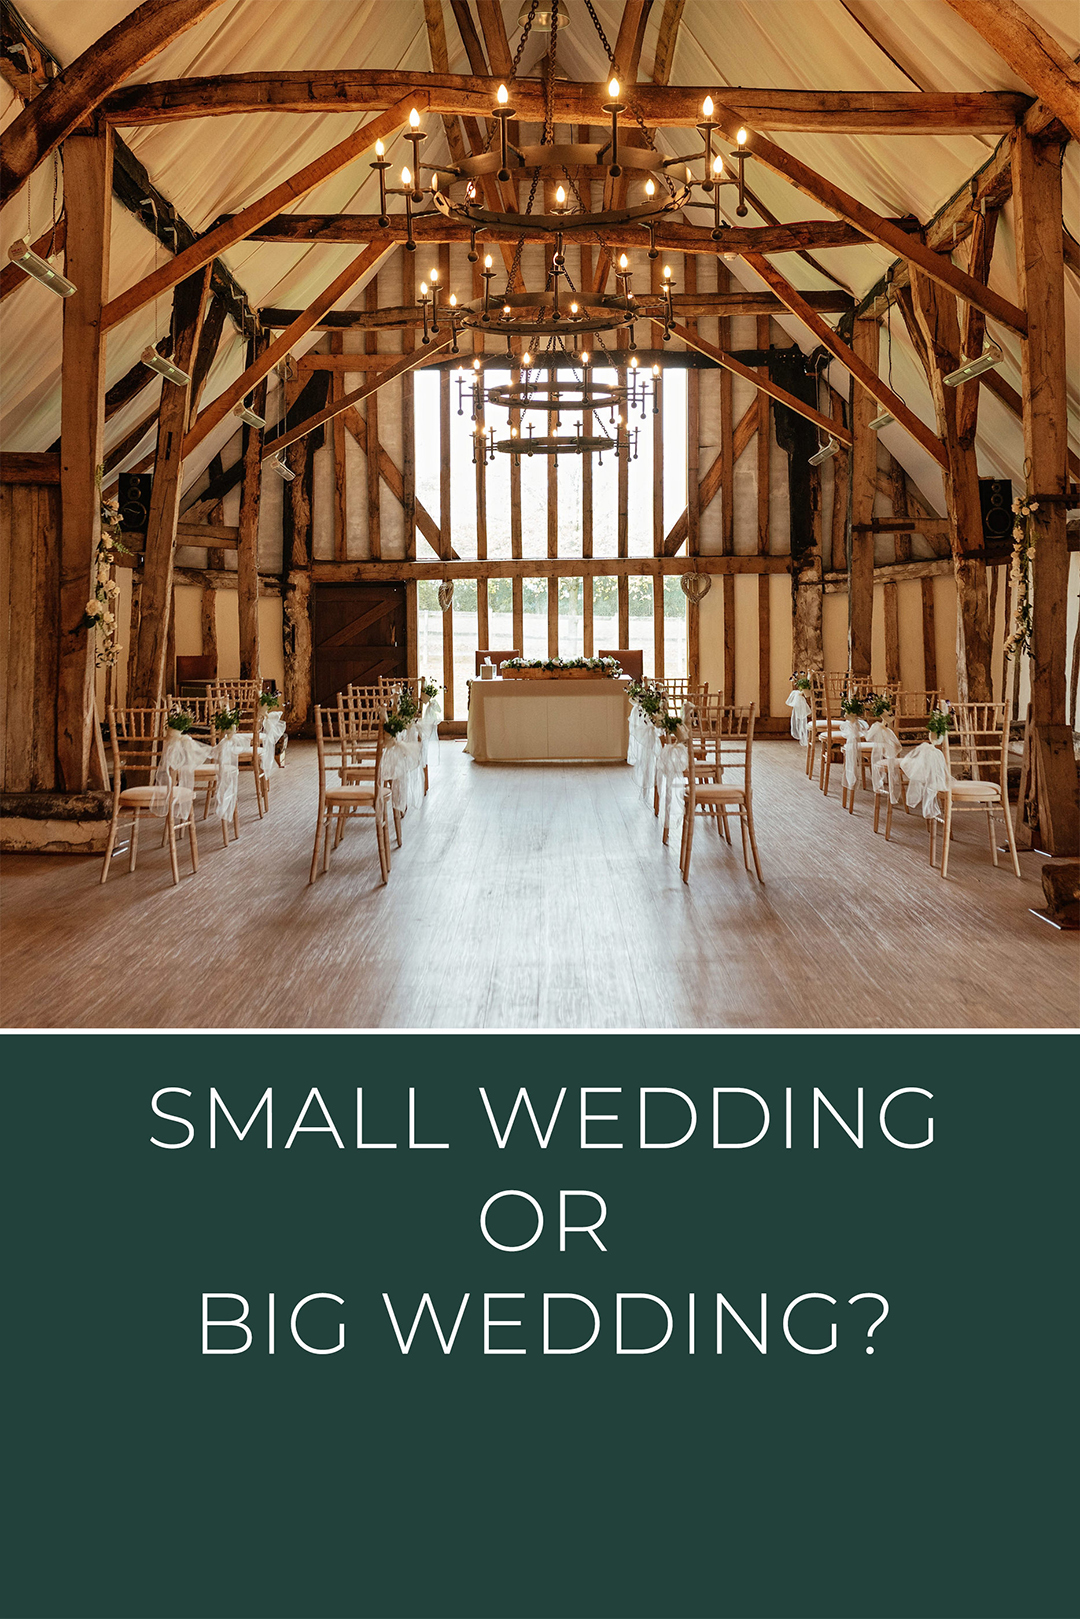 Small Wedding or Big Wedding, chair layout in big venue for small wedding